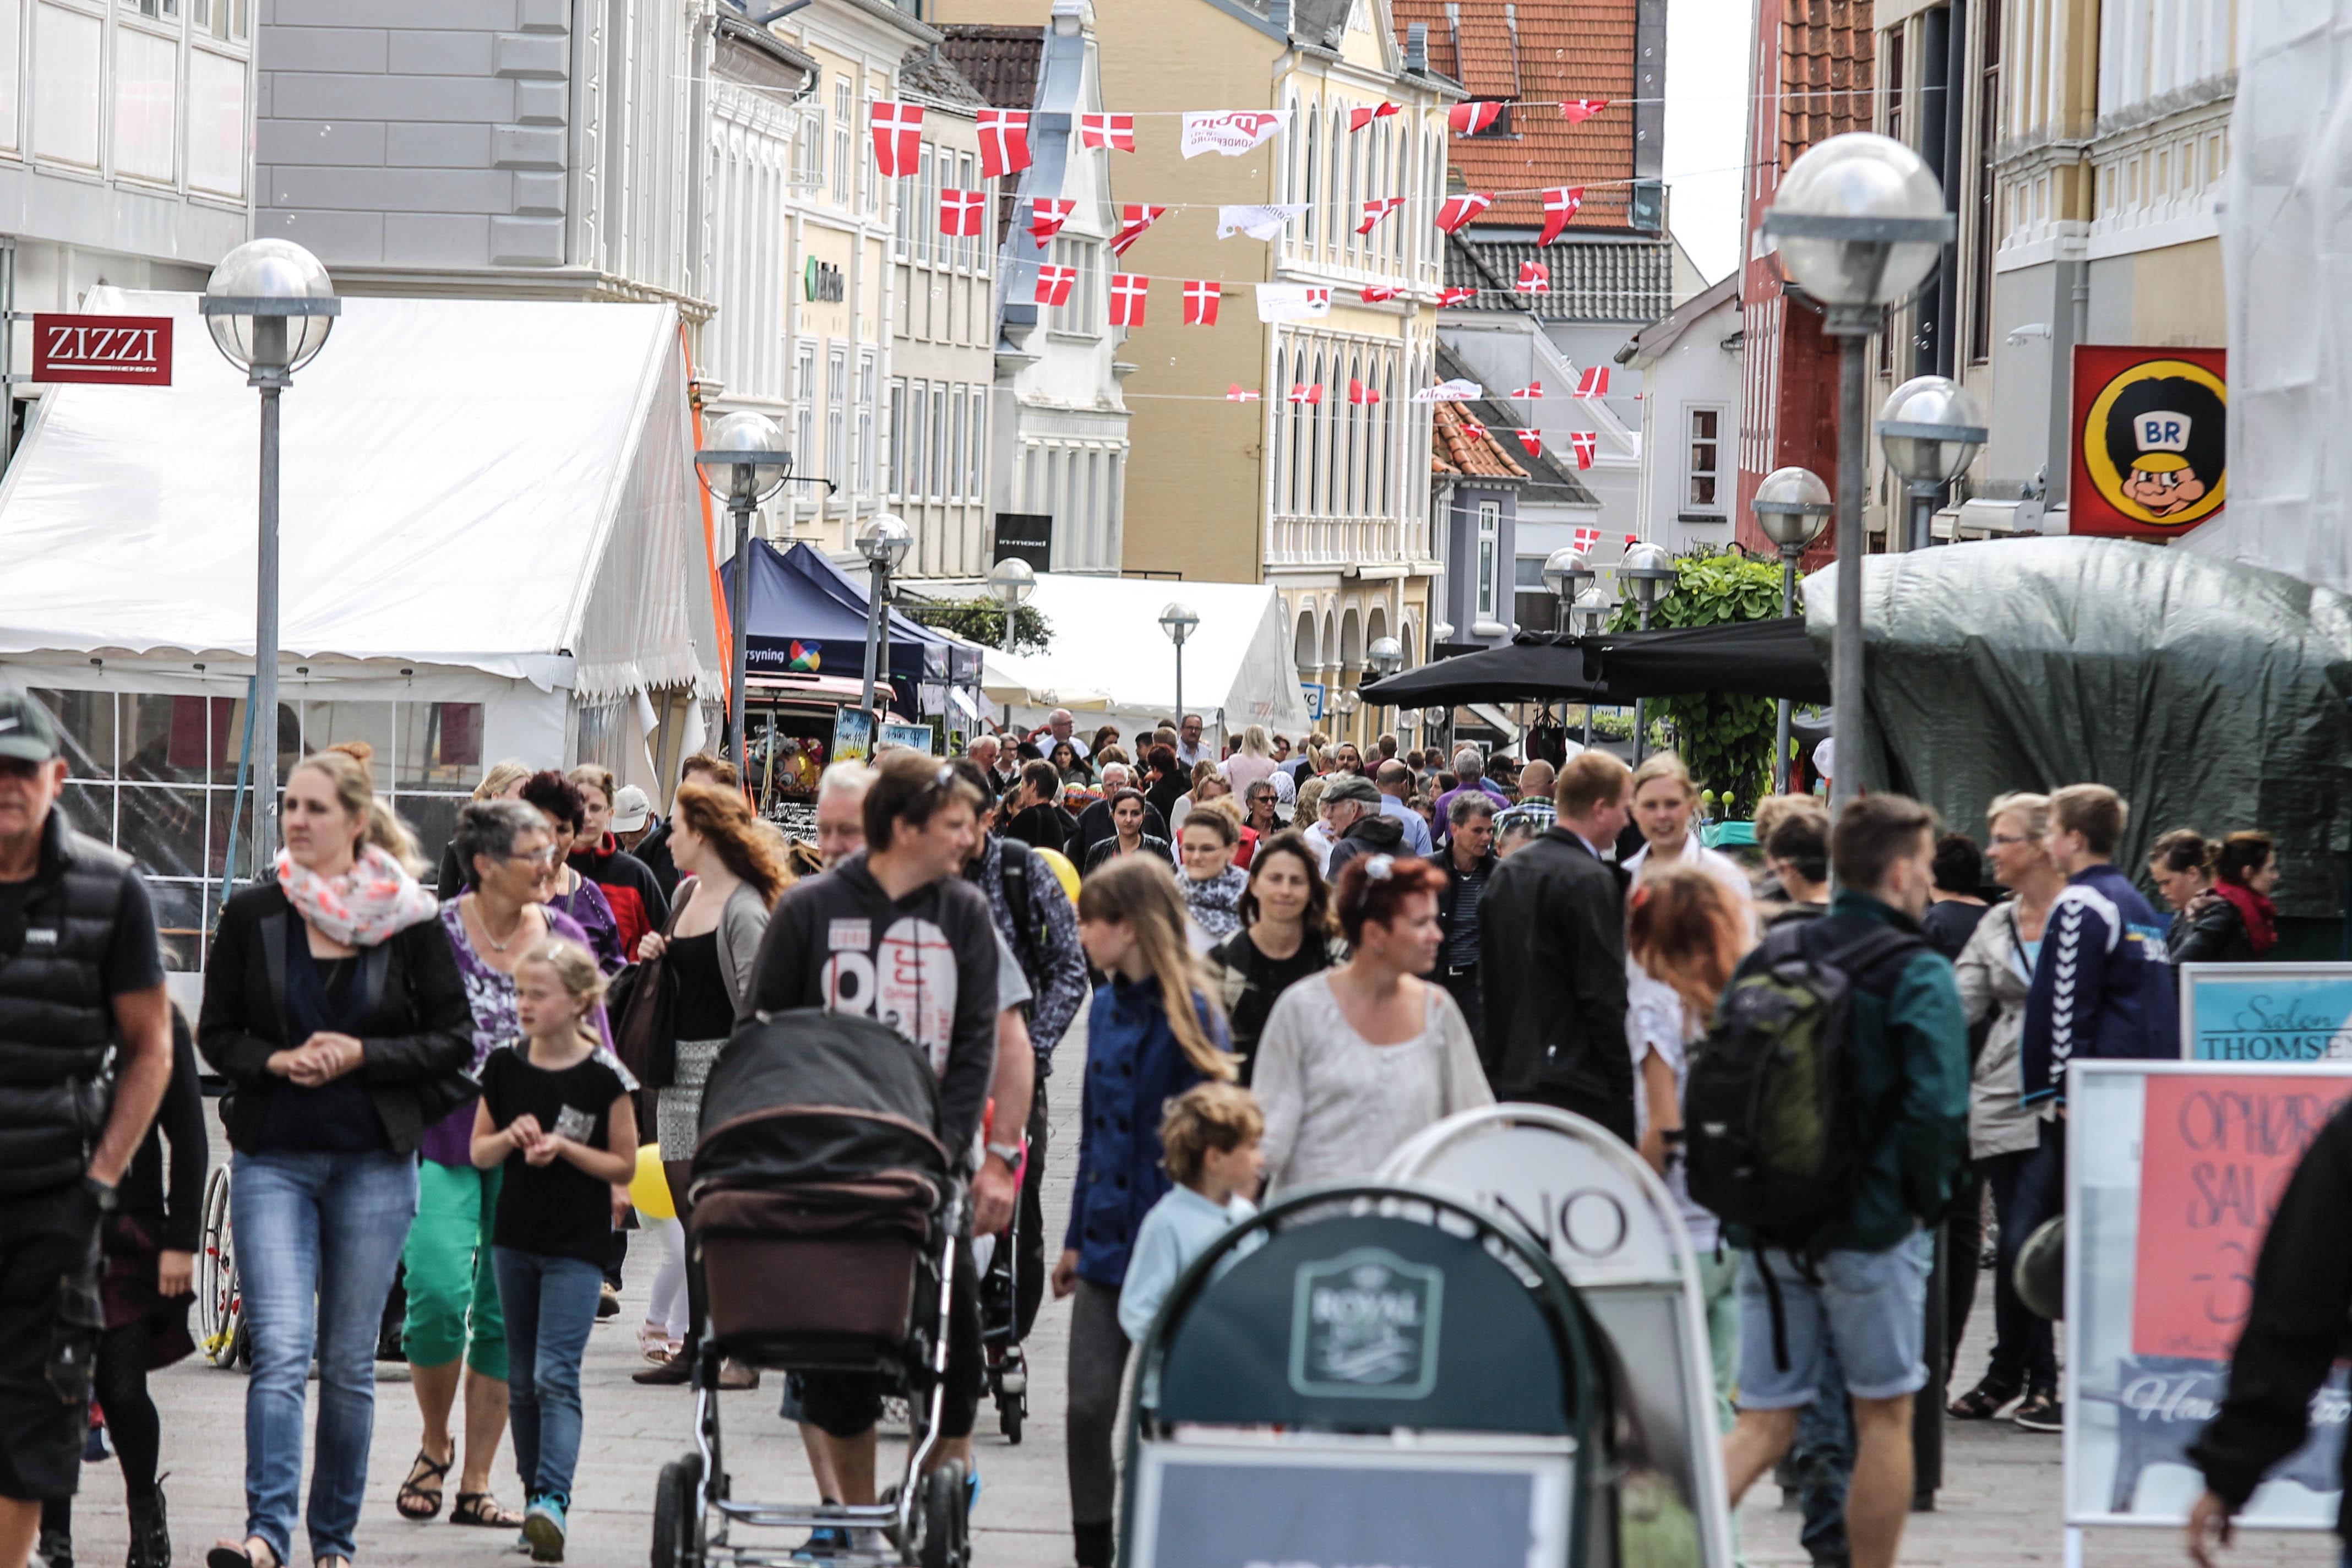 augustenborg muslim 2018-05-20t17:54:05000000000+02:00 fodbold, serie 2, mænd: midtals-aabenraa bk 3-2 (2-1) augustenborg:  hver 20 borger i danmark er muslim.